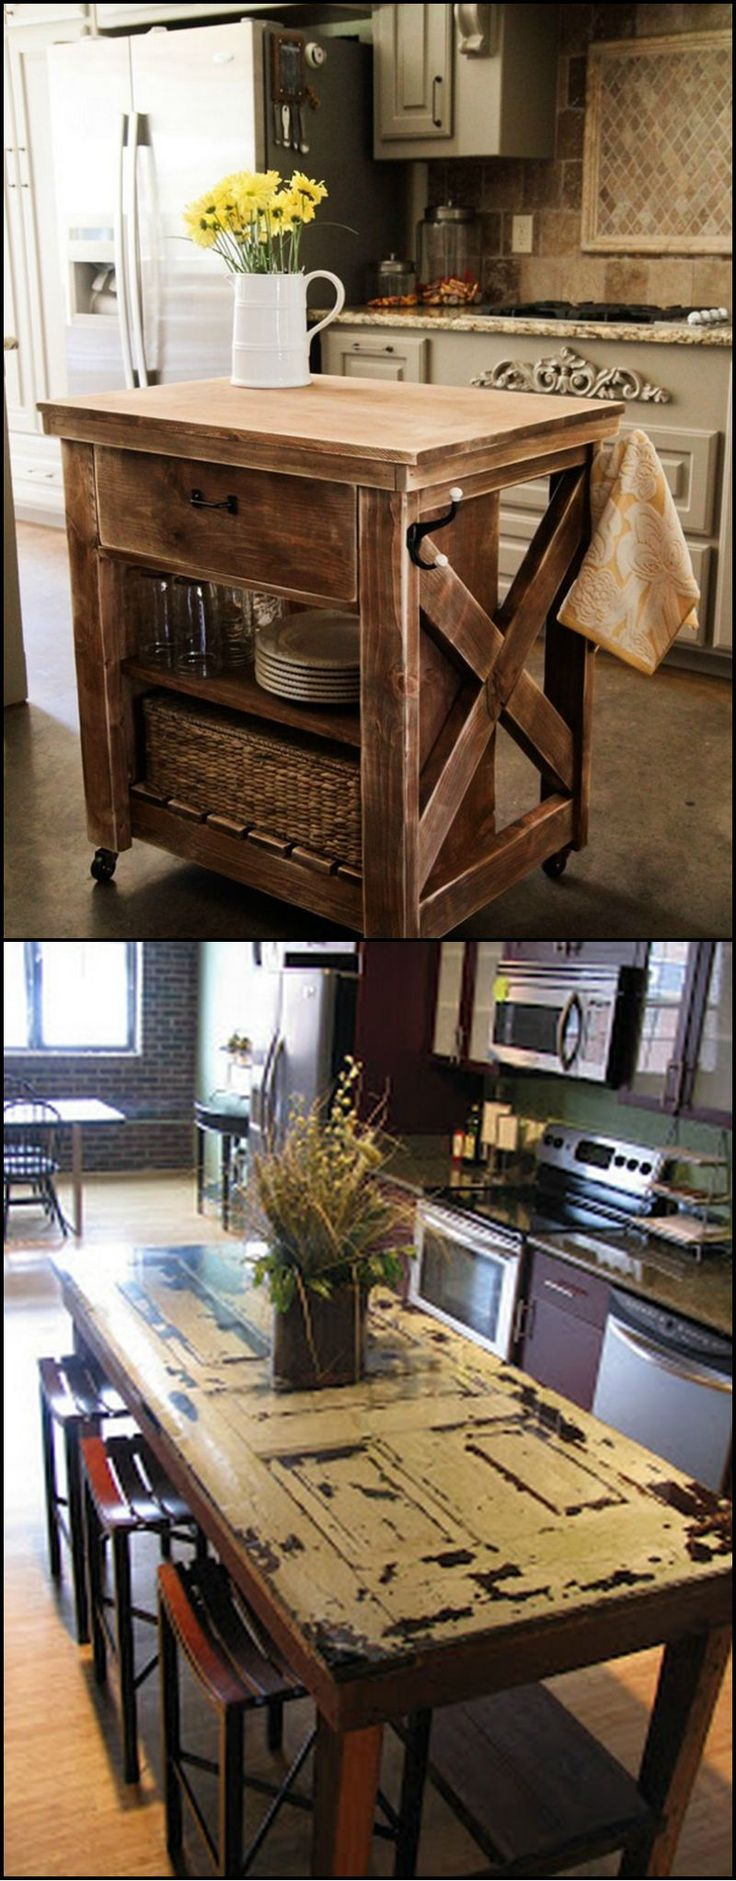 New Kitchen Island Ideas 105 best kitchen ideas images on pinterest | kitchen ideas